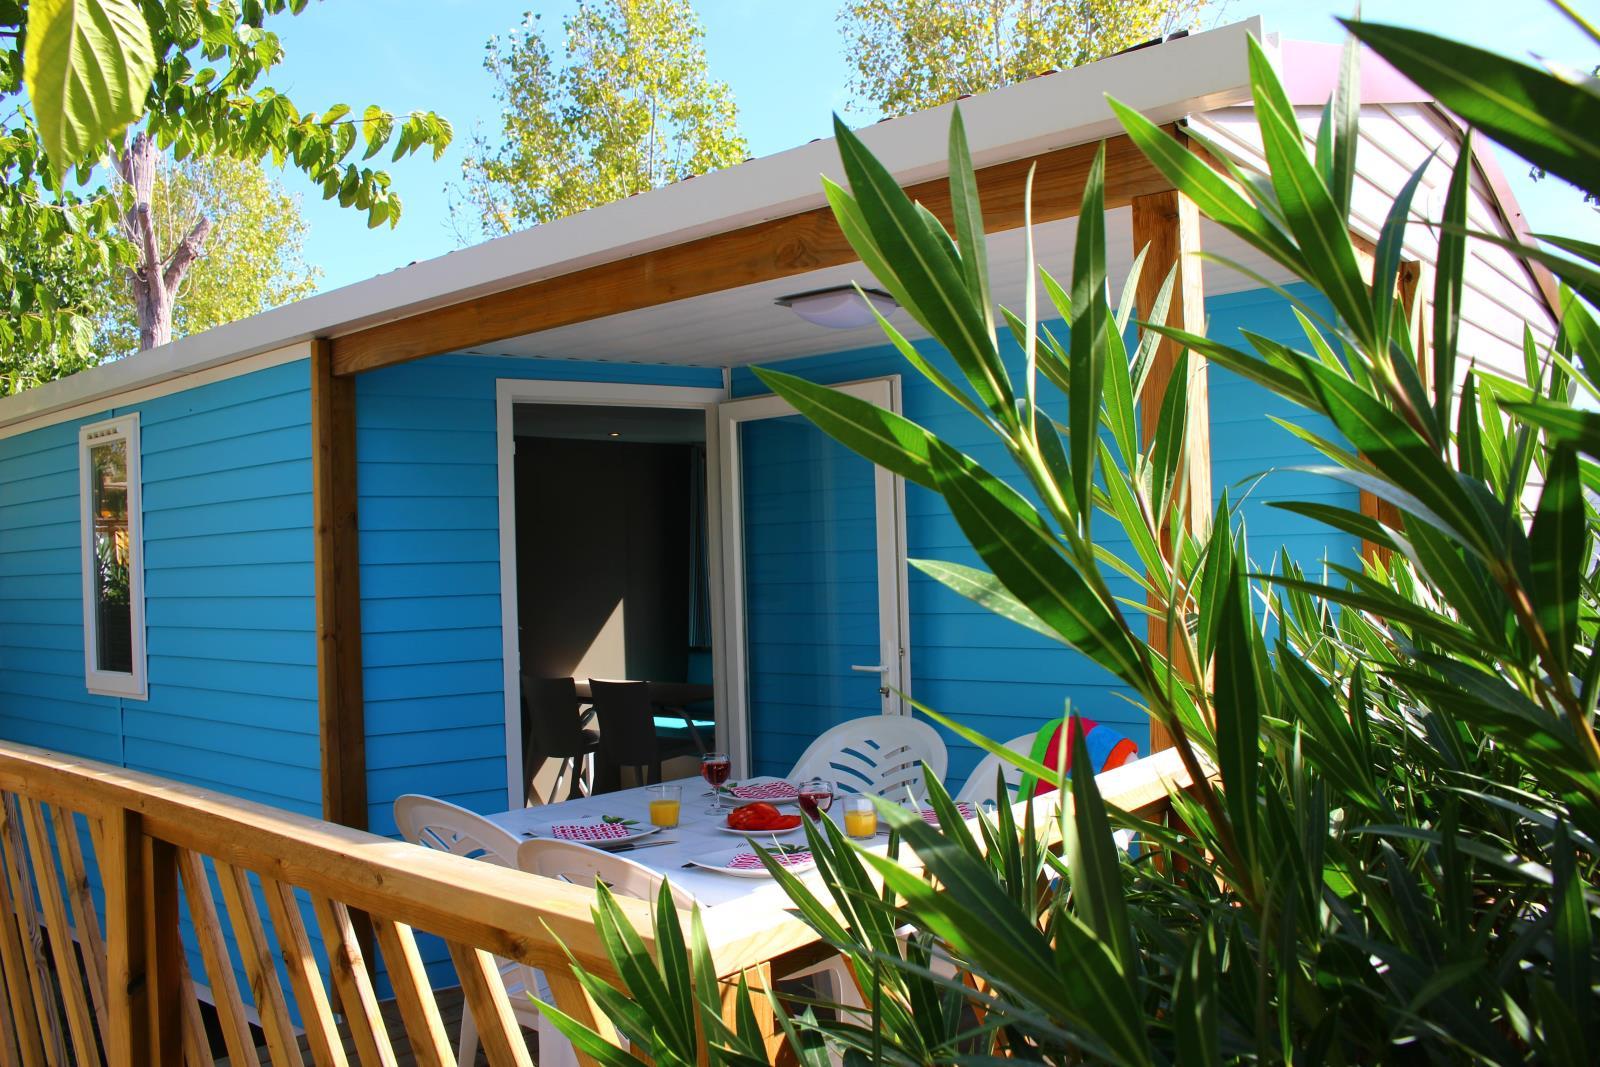 Location - Cancun, Premium - Samedi - 2 Chambres - Camping L'Air Marin